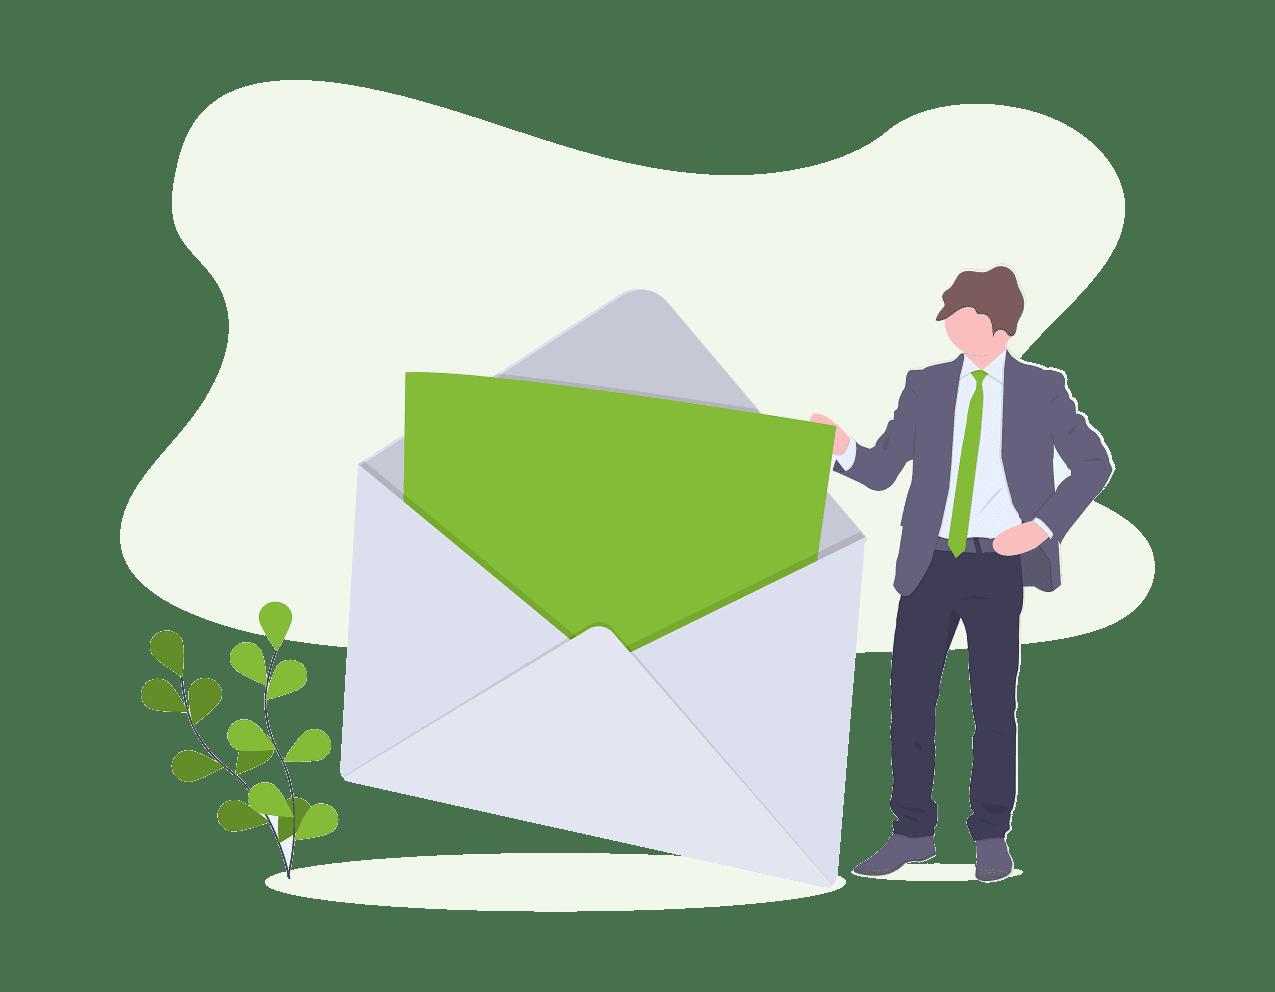 undraw_envelope_n8lc (1)